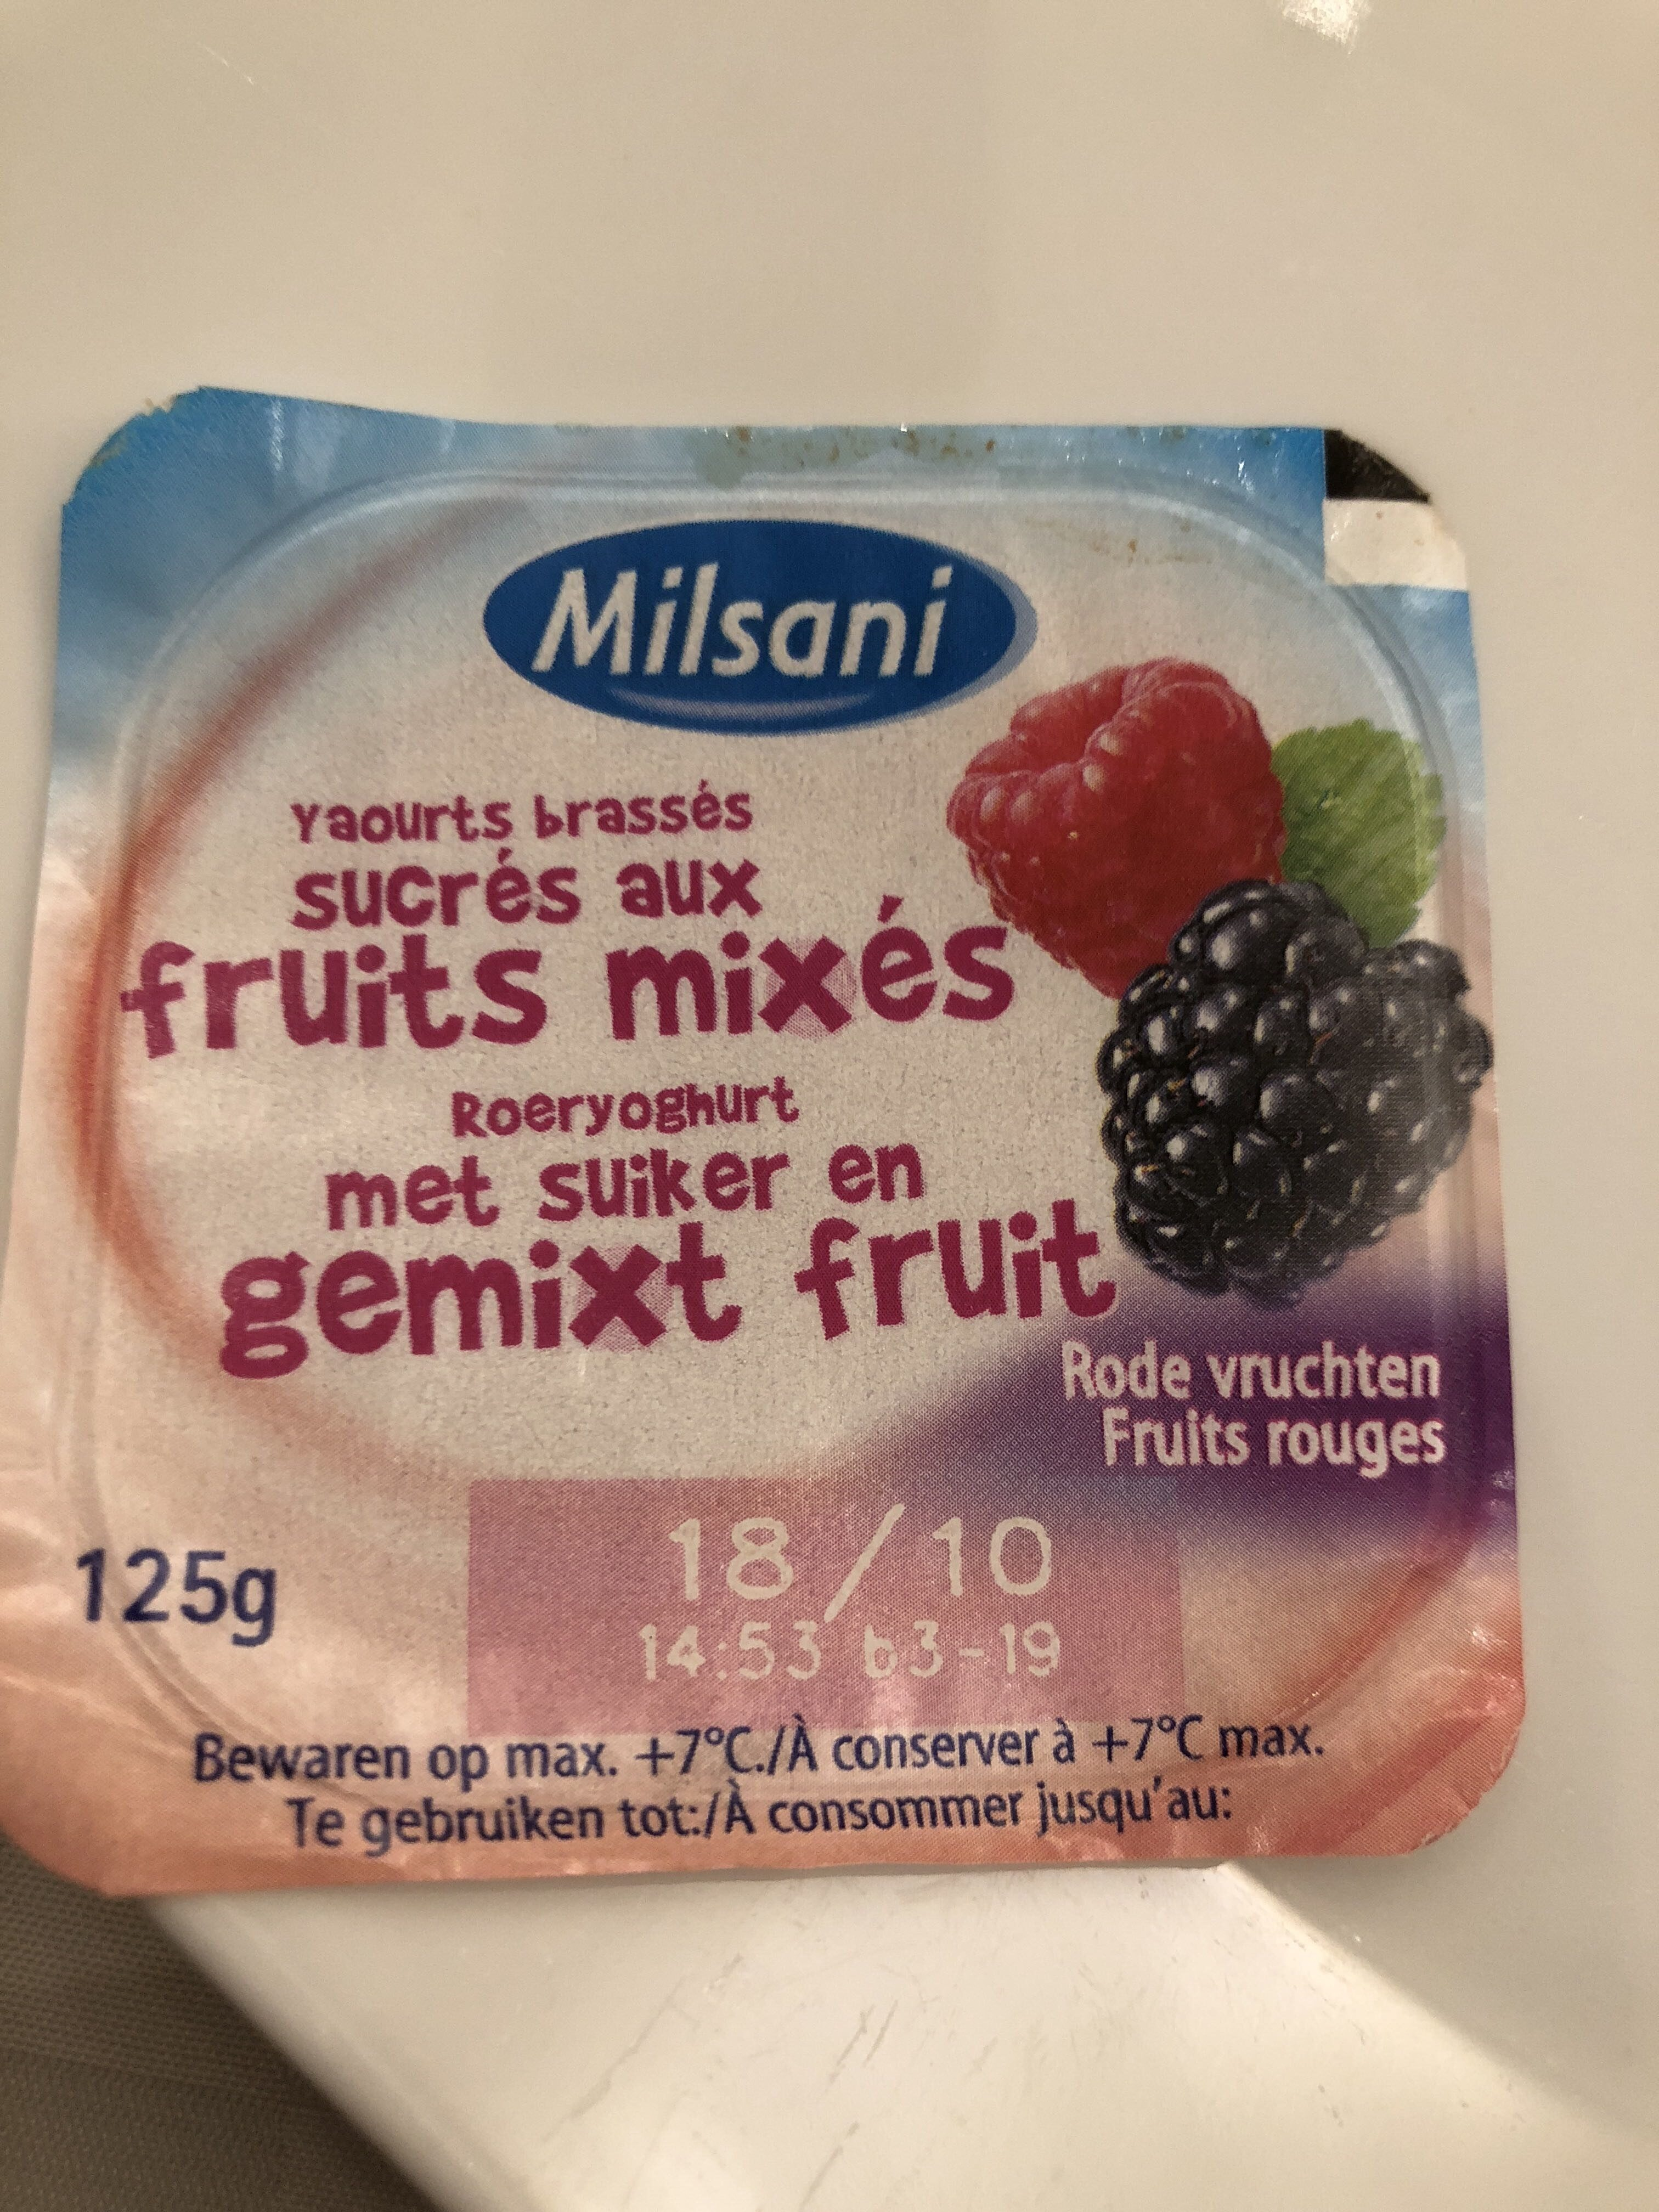 Milsani jogging morango - Produkt - pl